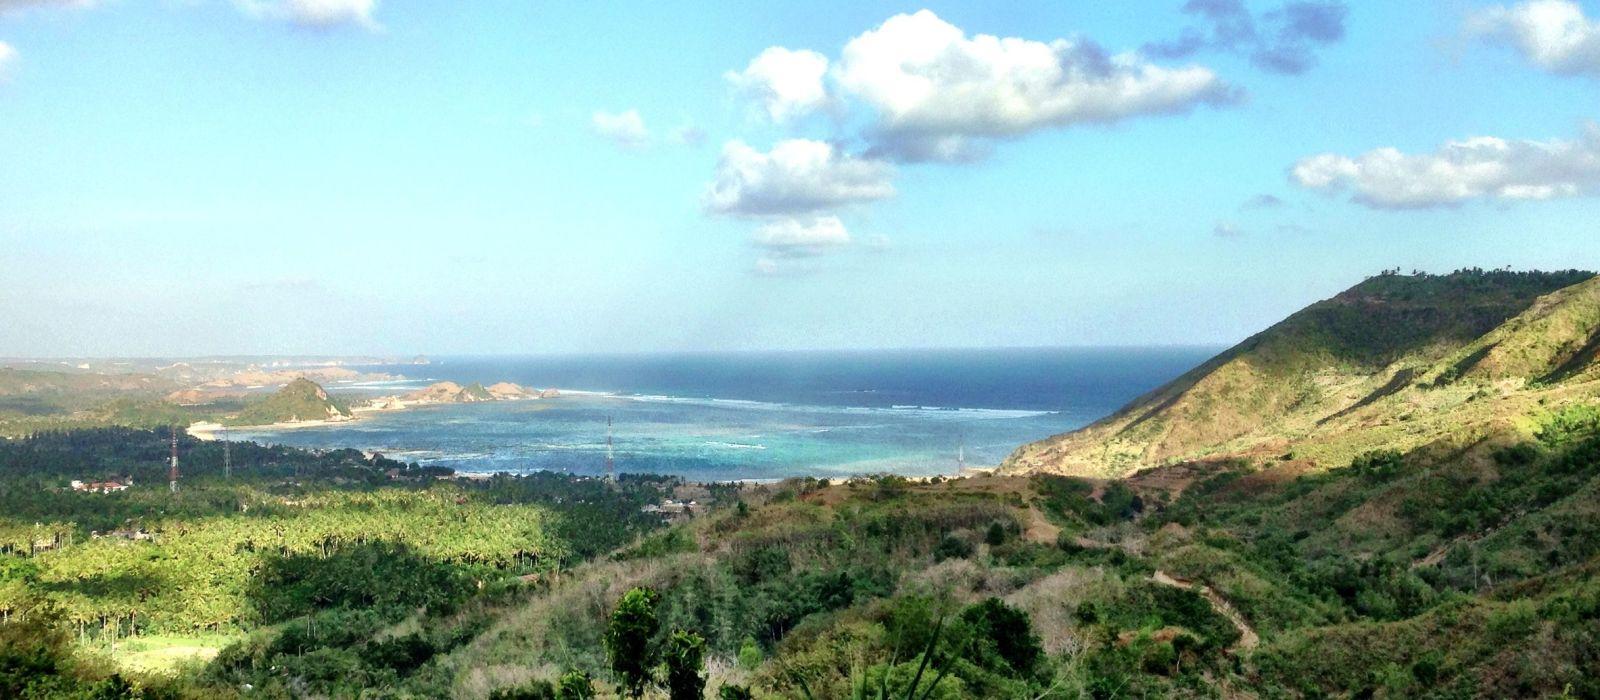 Destination Lombok Indonesia